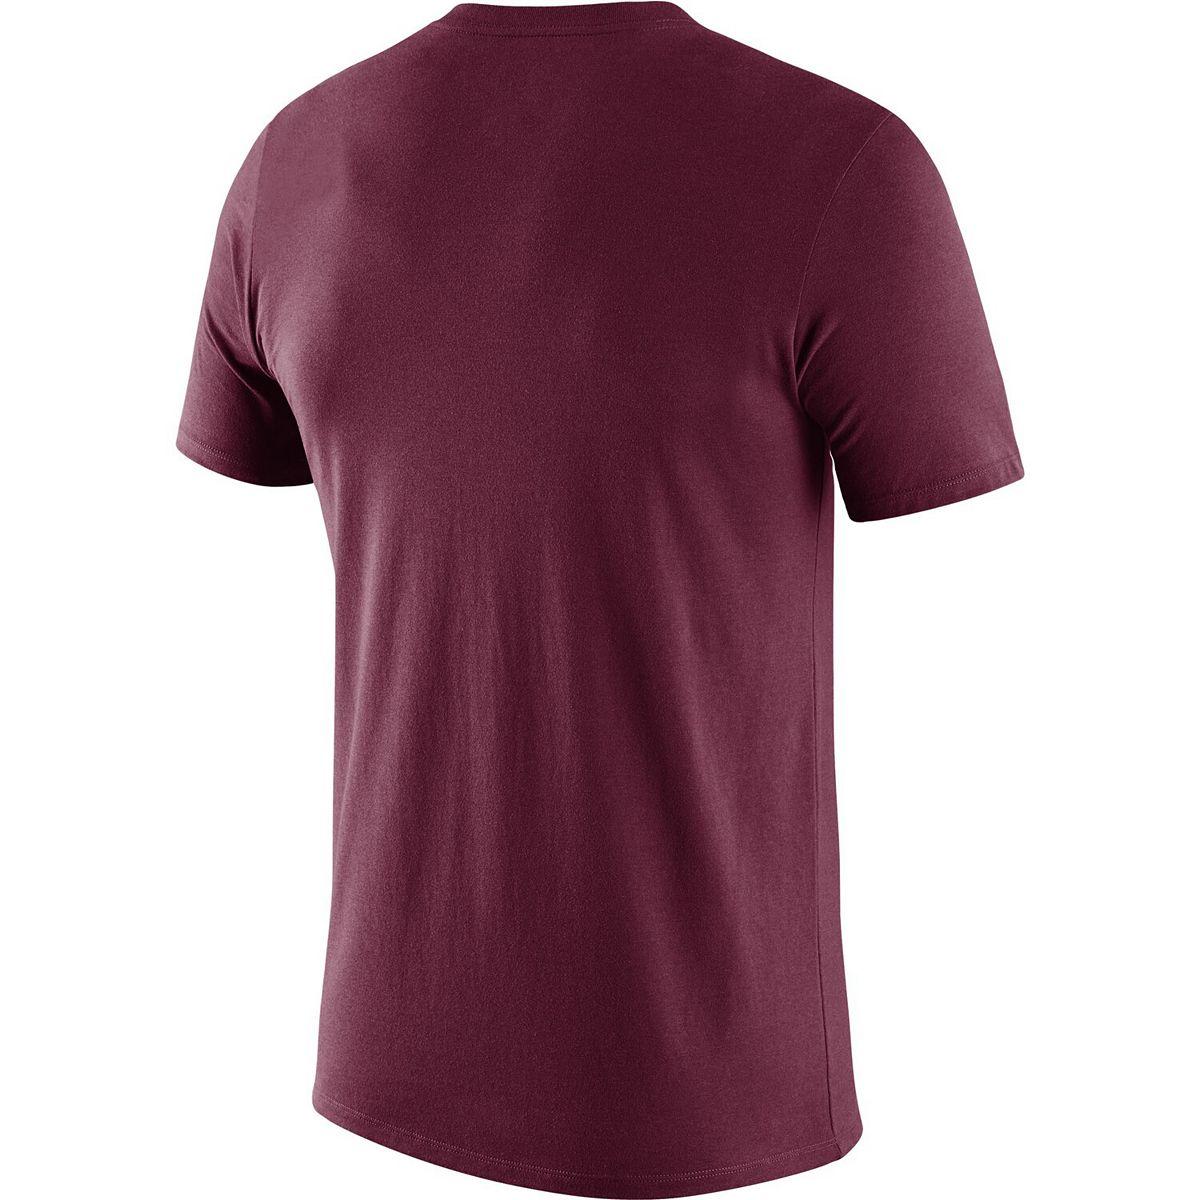 Men's Nike Garnet Florida State Seminoles Football Performance T-Shirt vR4S5